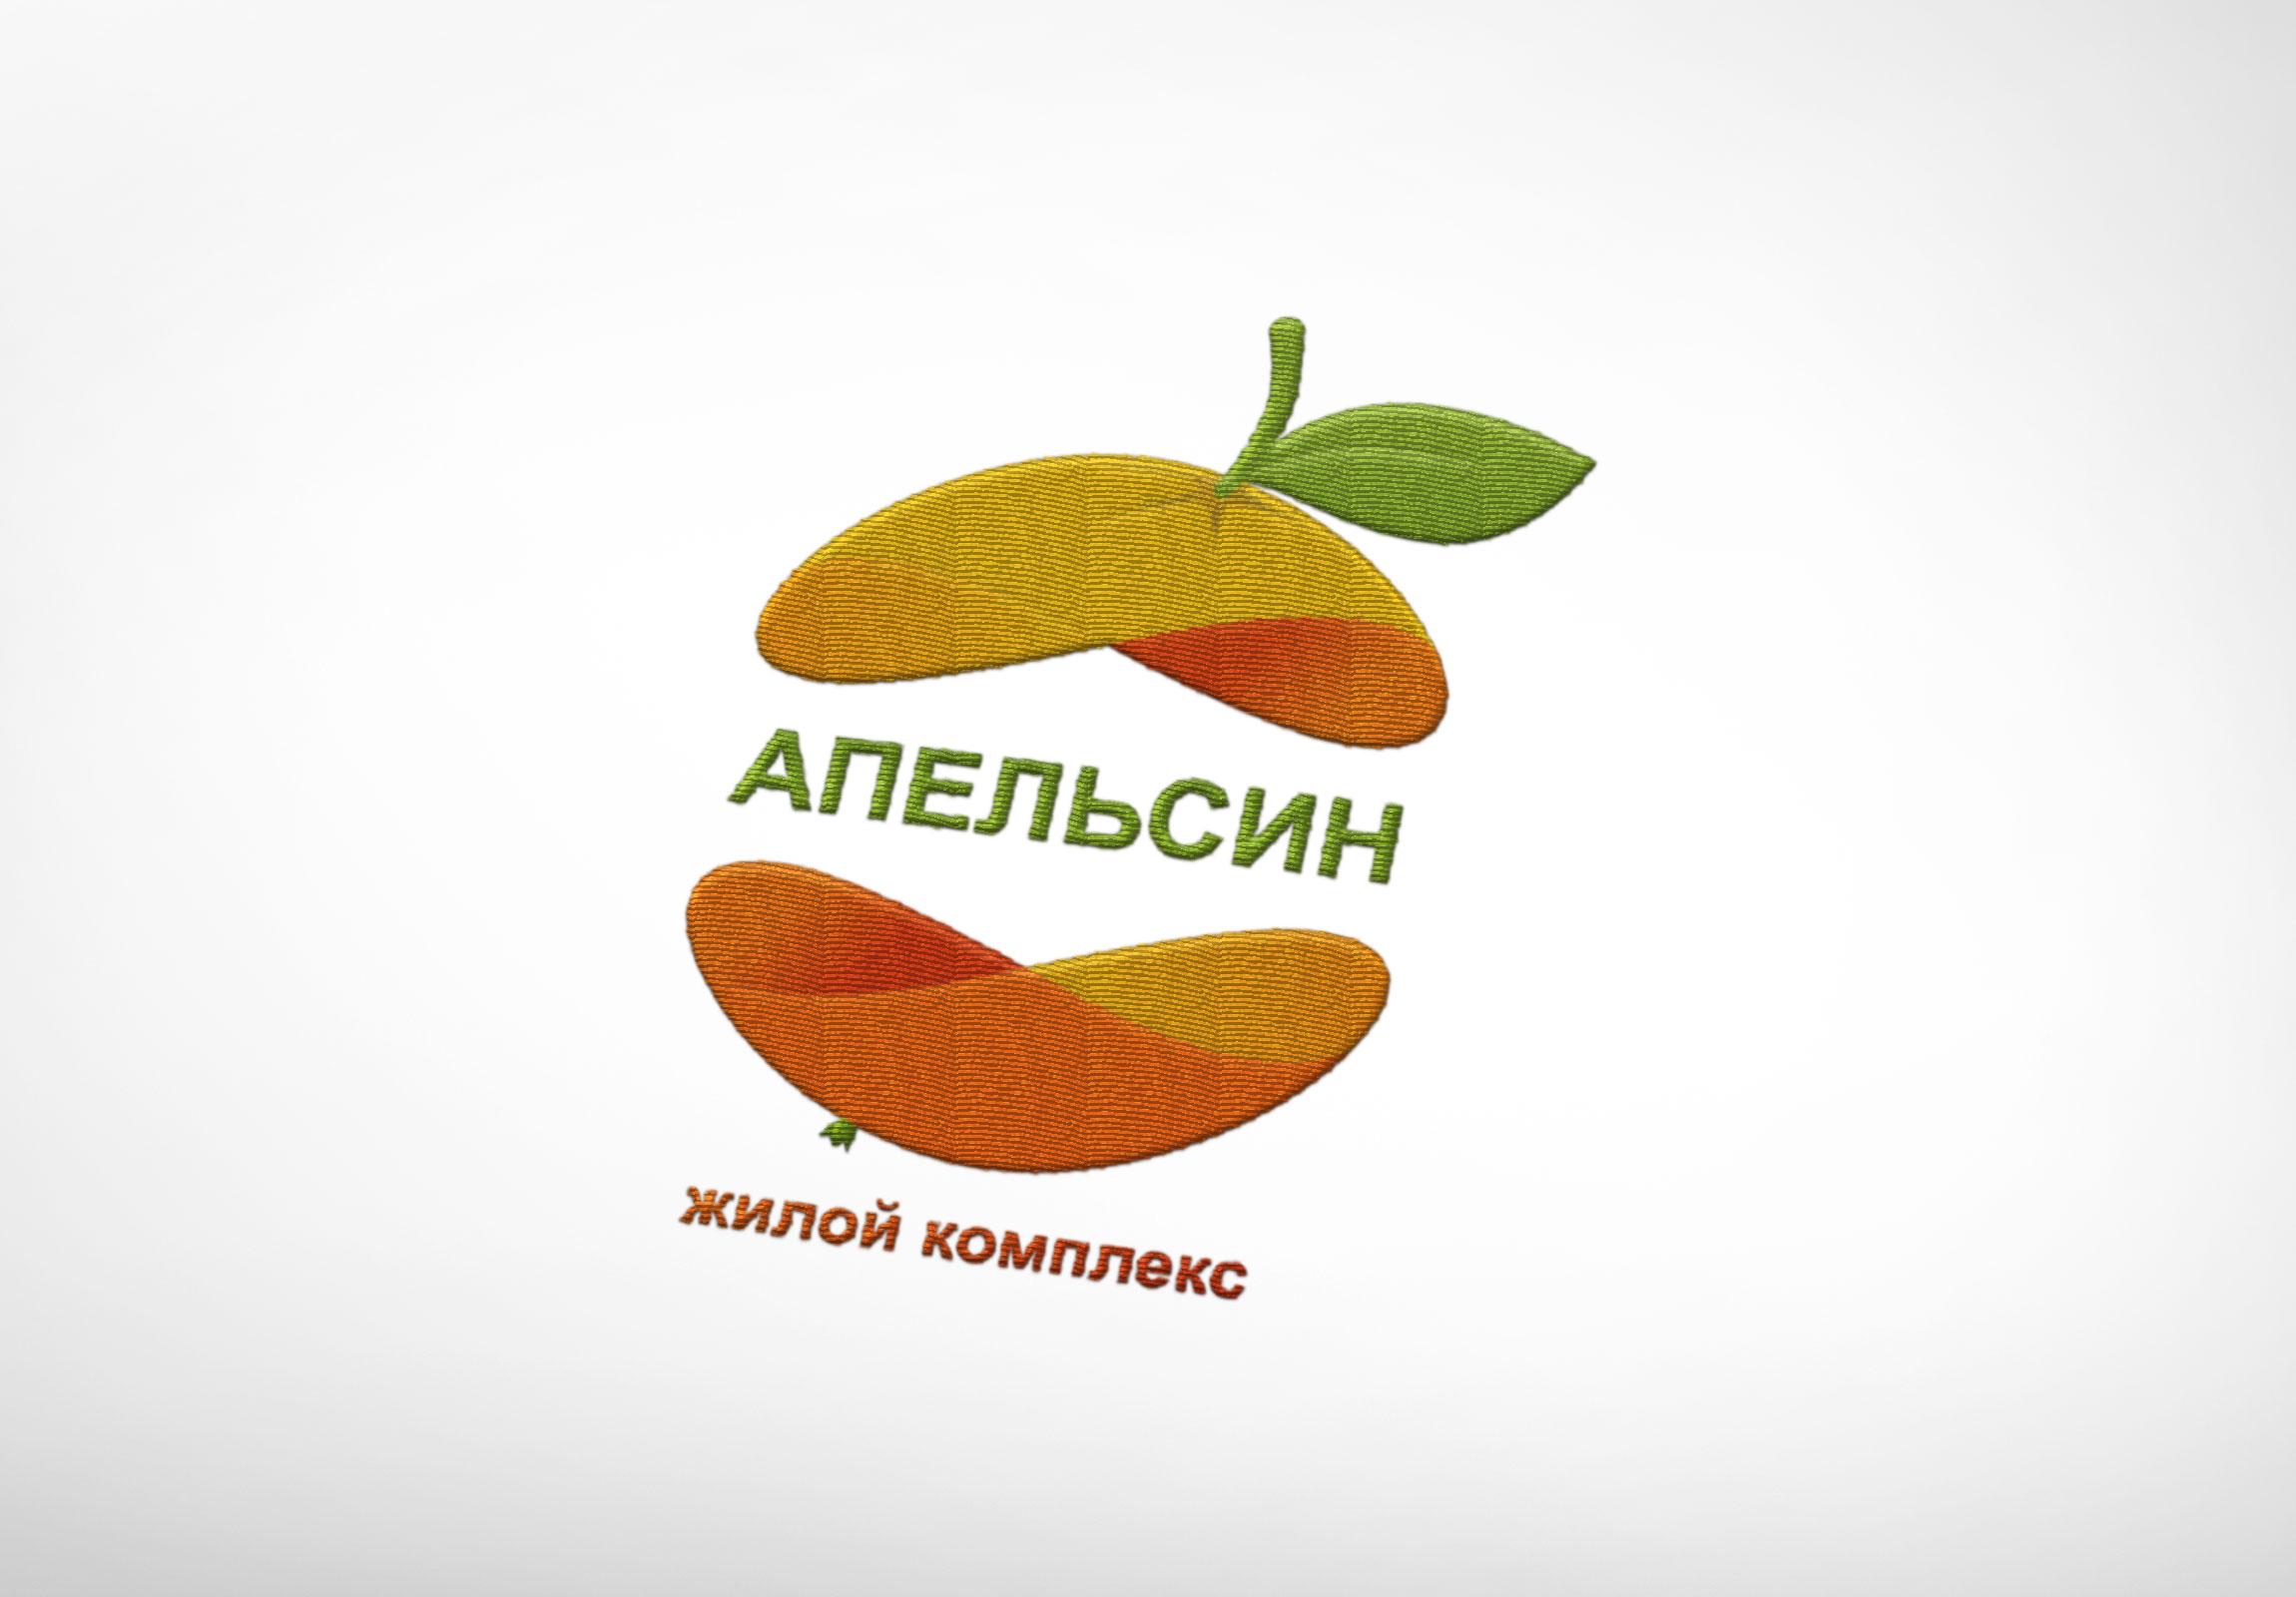 Логотип и фирменный стиль фото f_6365a59cd075b41c.jpg